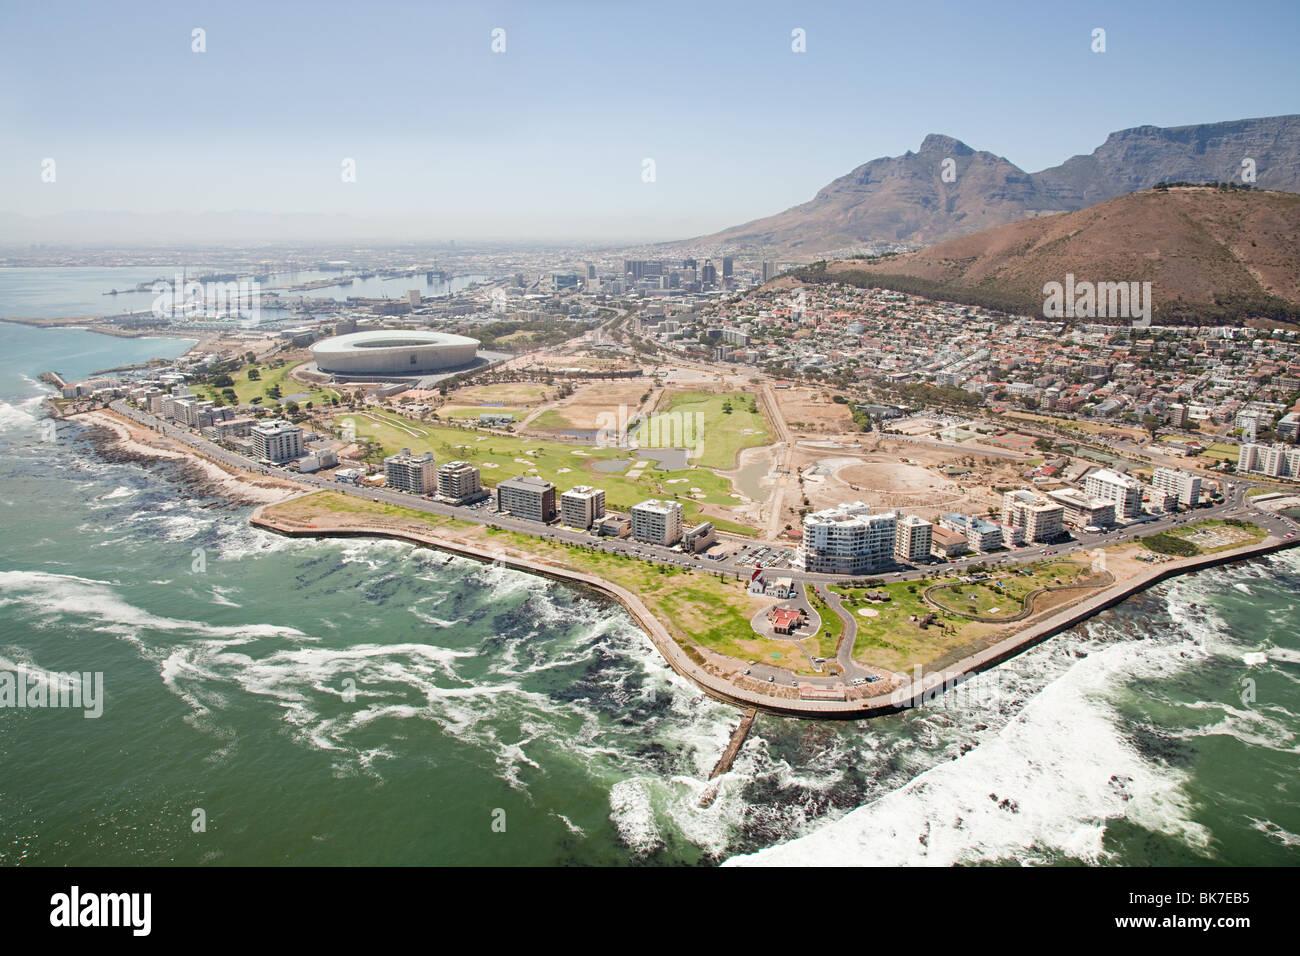 Cape town stadium and coast - Stock Image